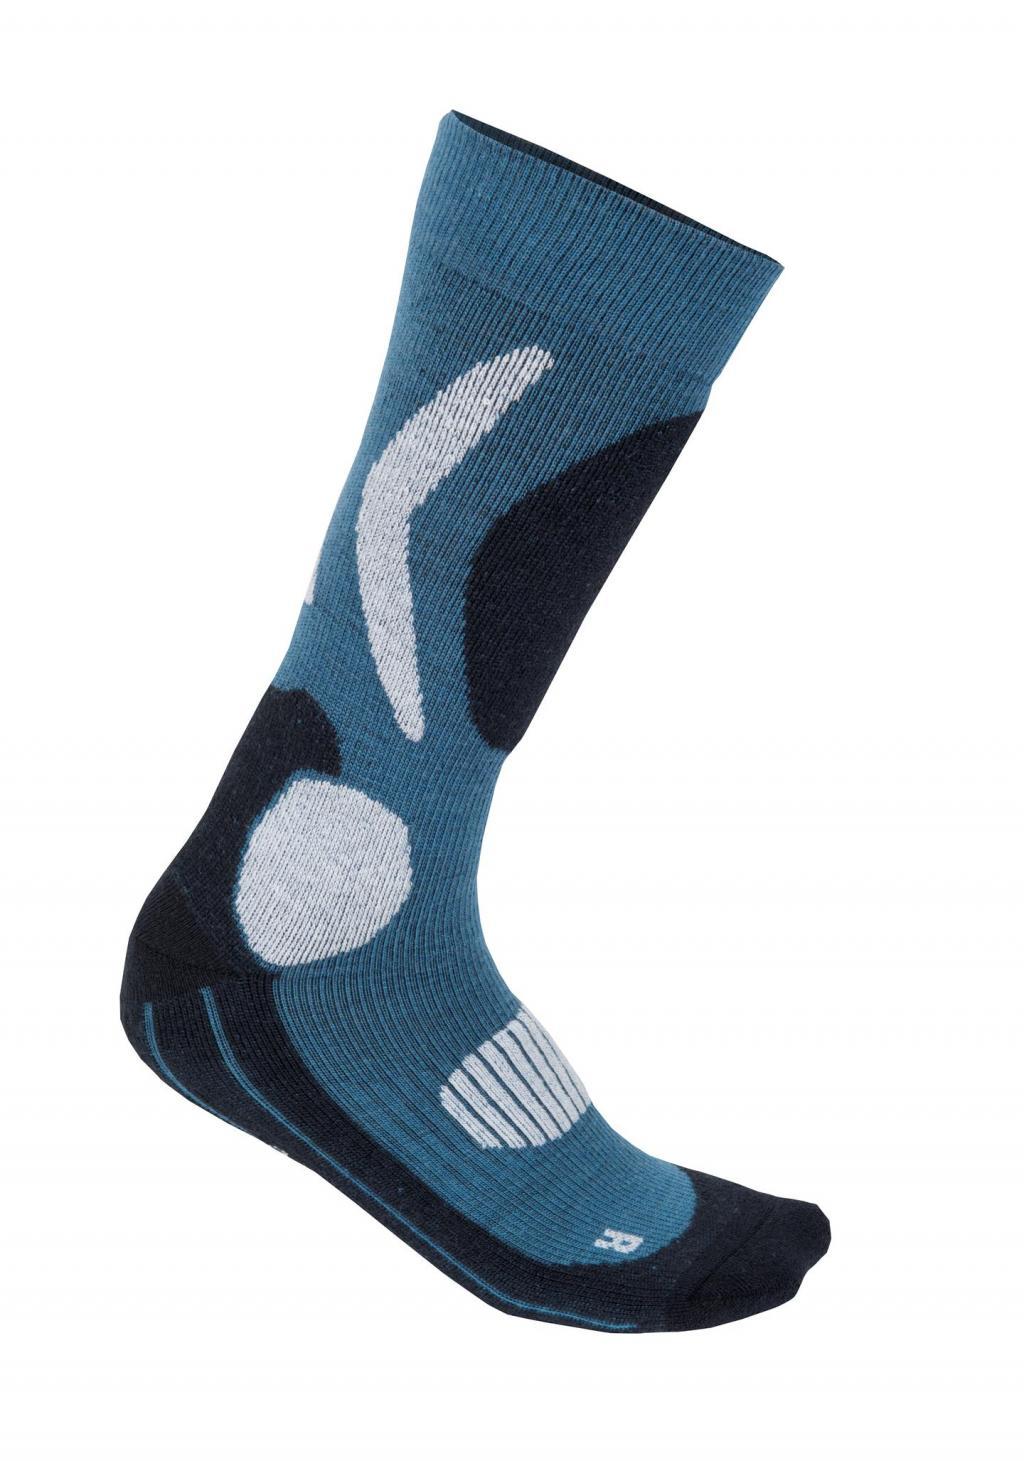 aclima x-country socks - blue sapphire